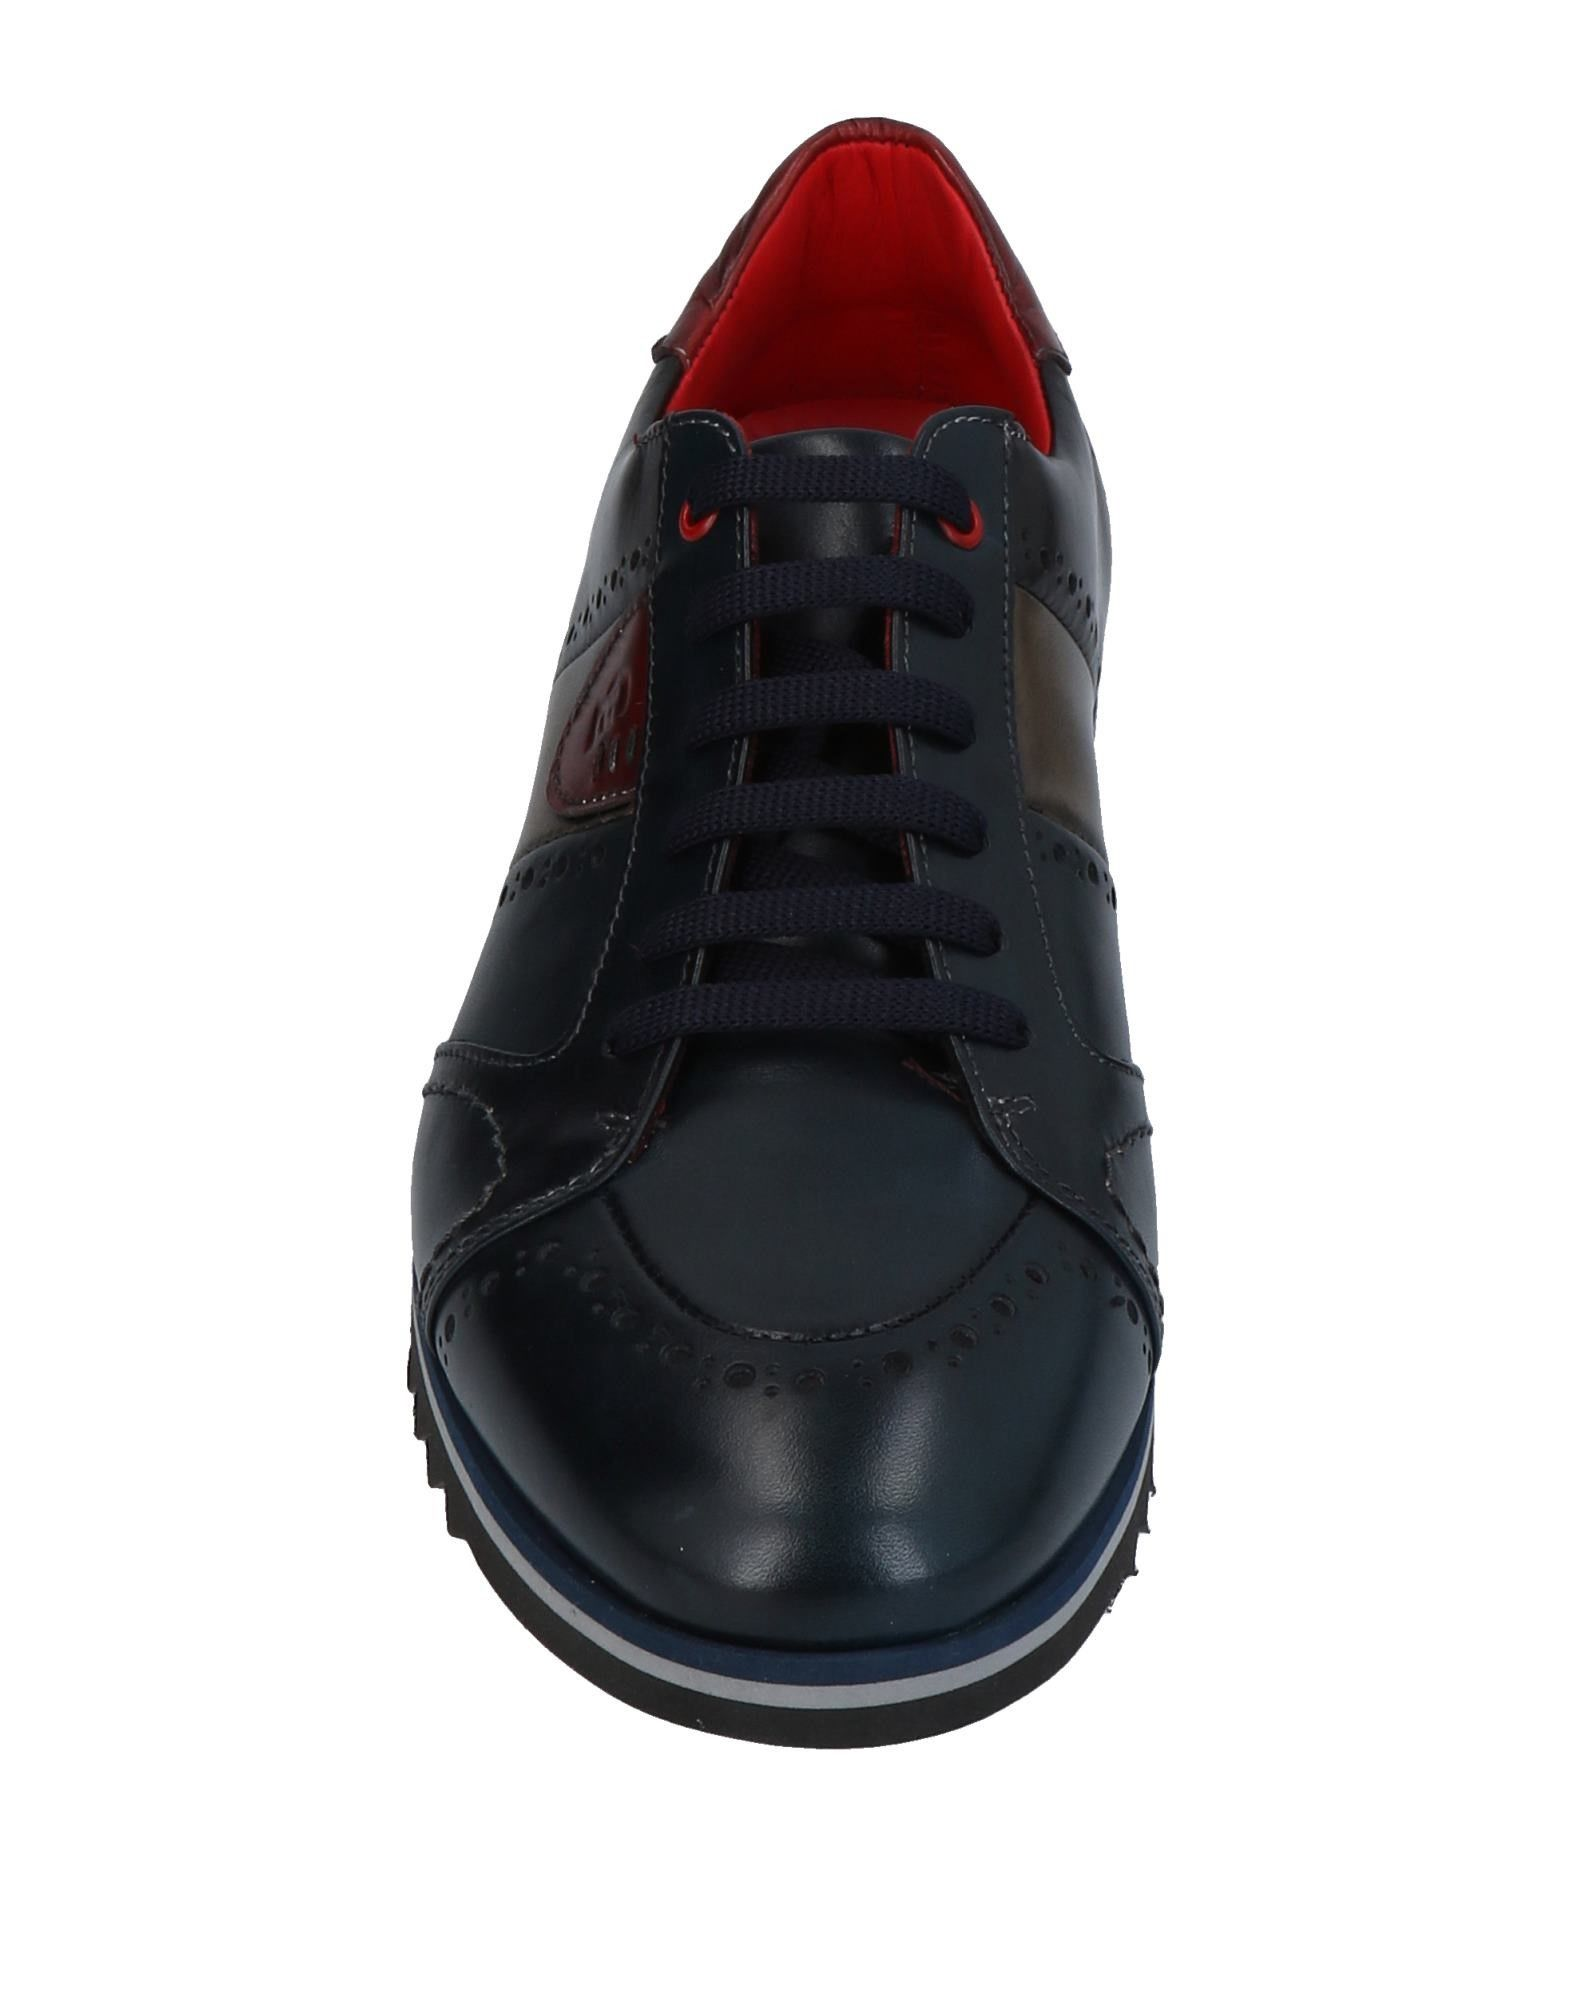 Sneakers Gianfranco Lattanzi Femme - Sneakers Gianfranco Lattanzi sur